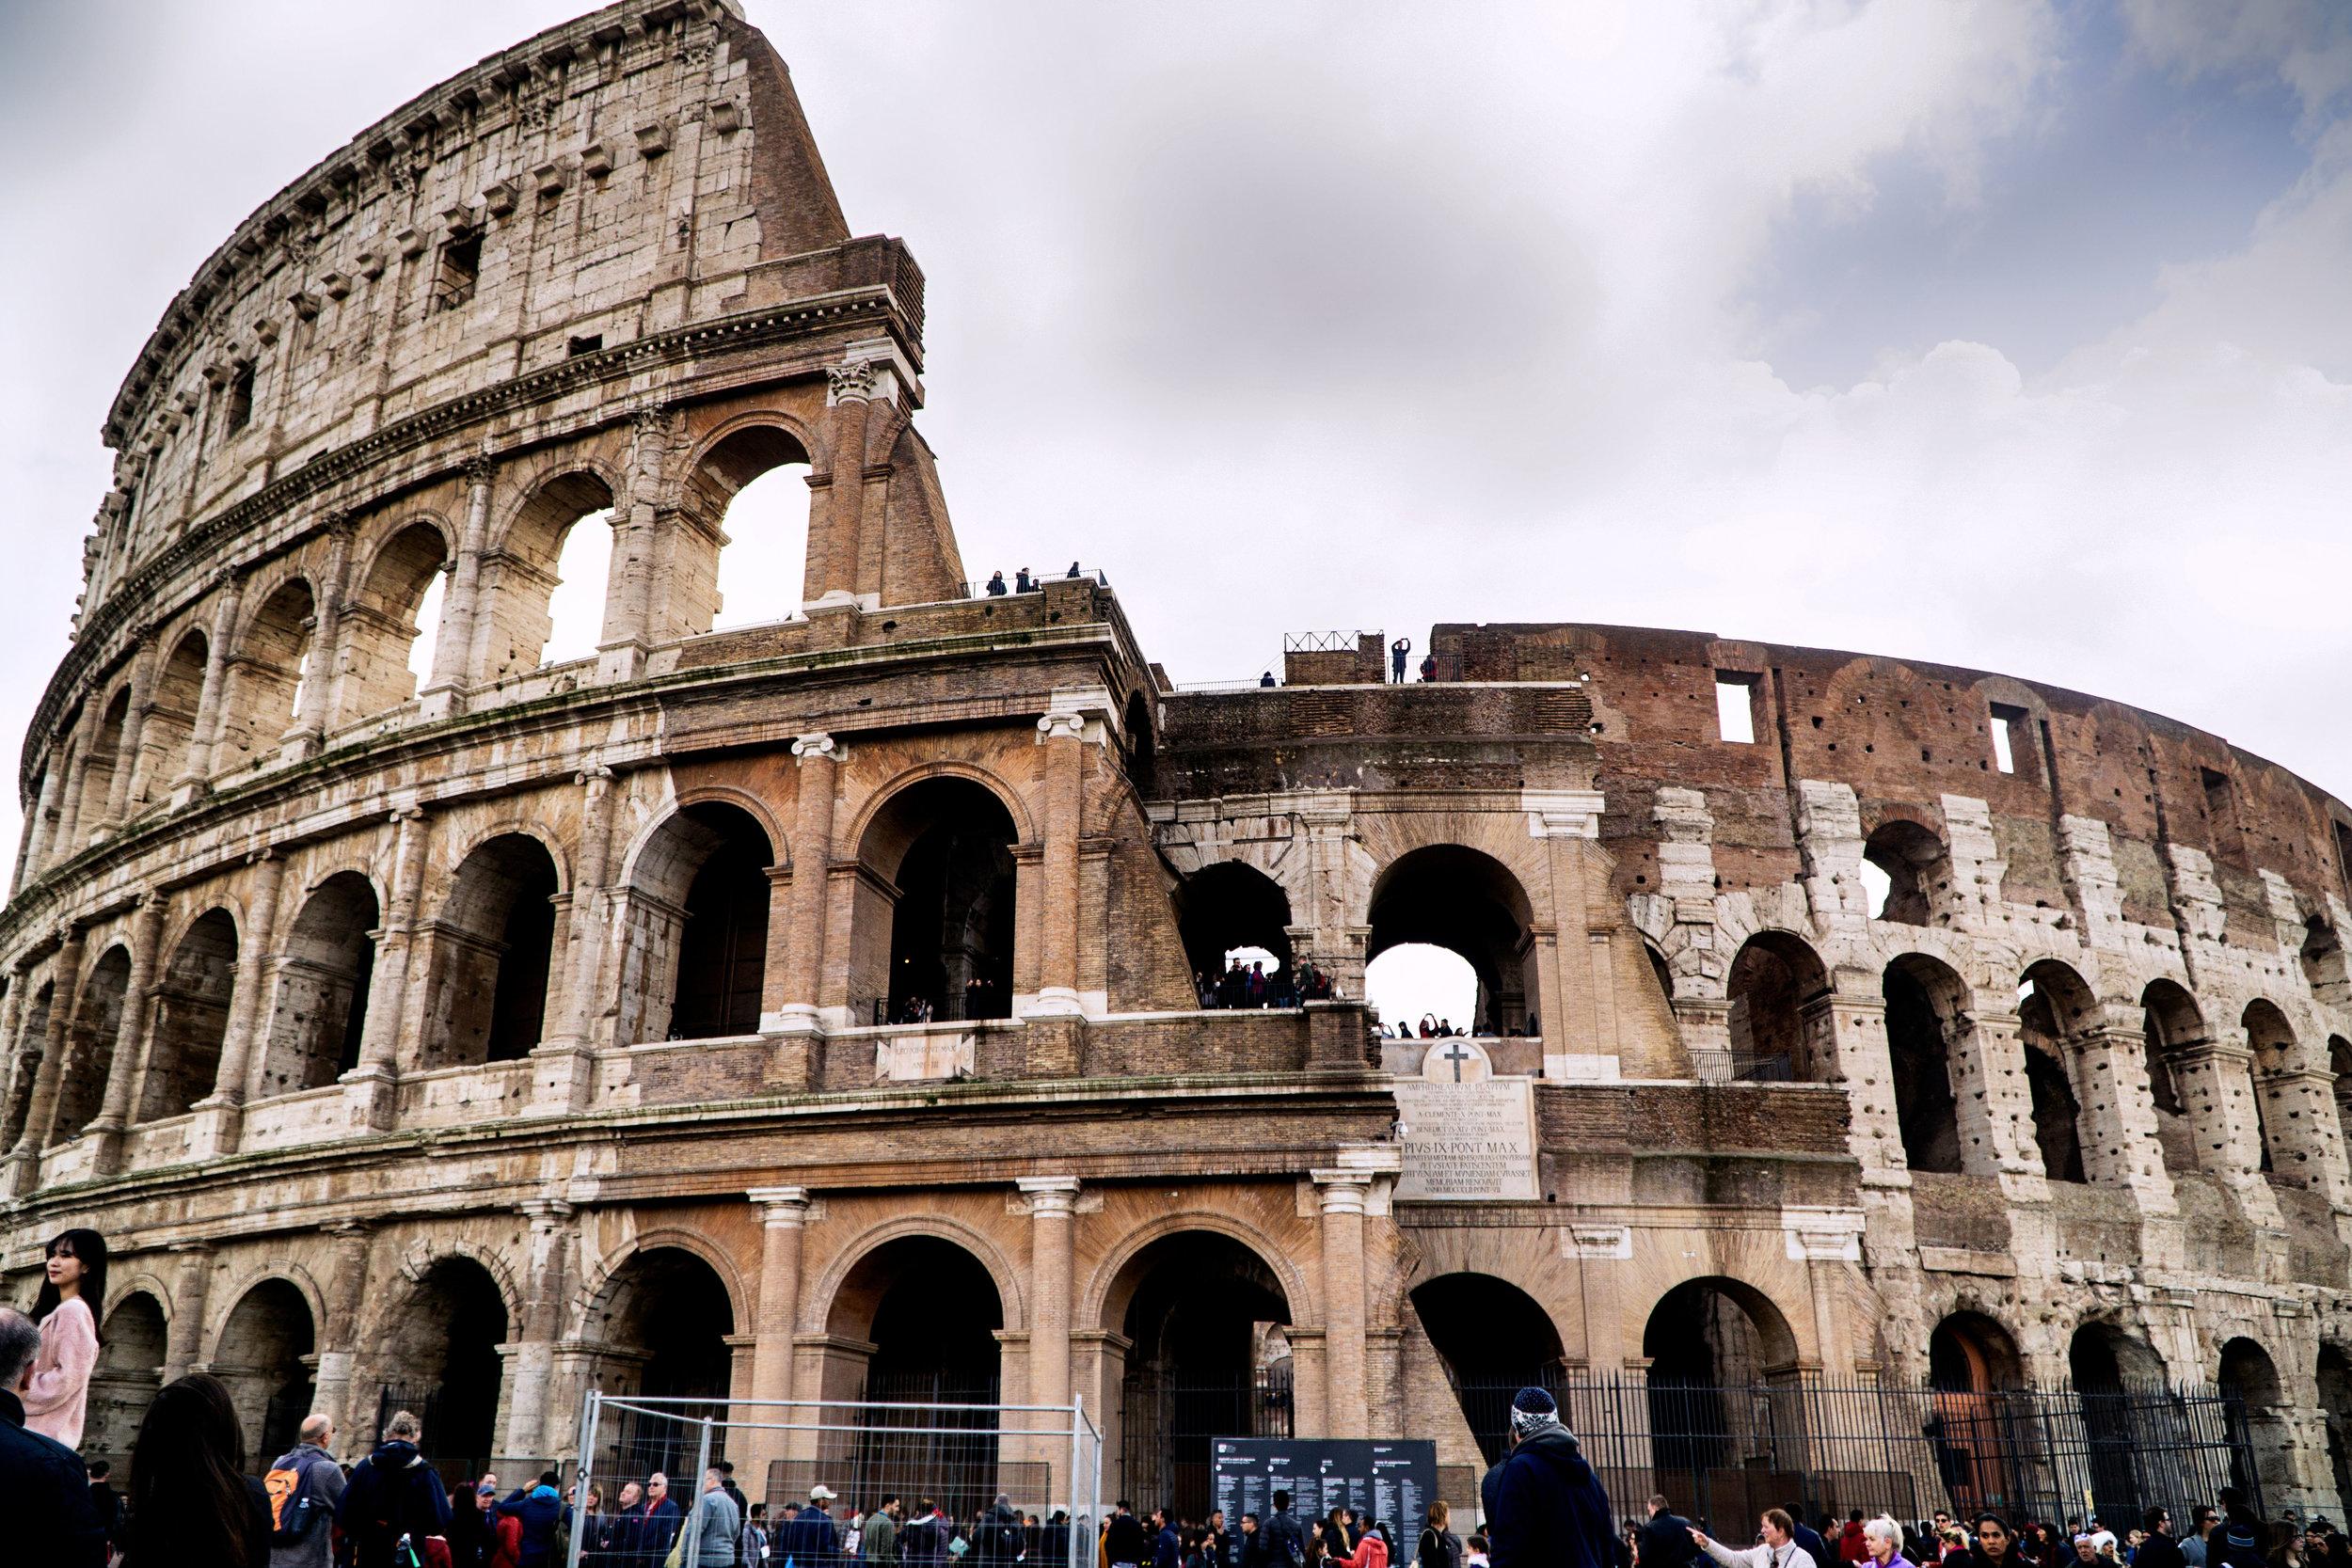 rome_colosseum_vickygood_travel_photography2sm.jpg